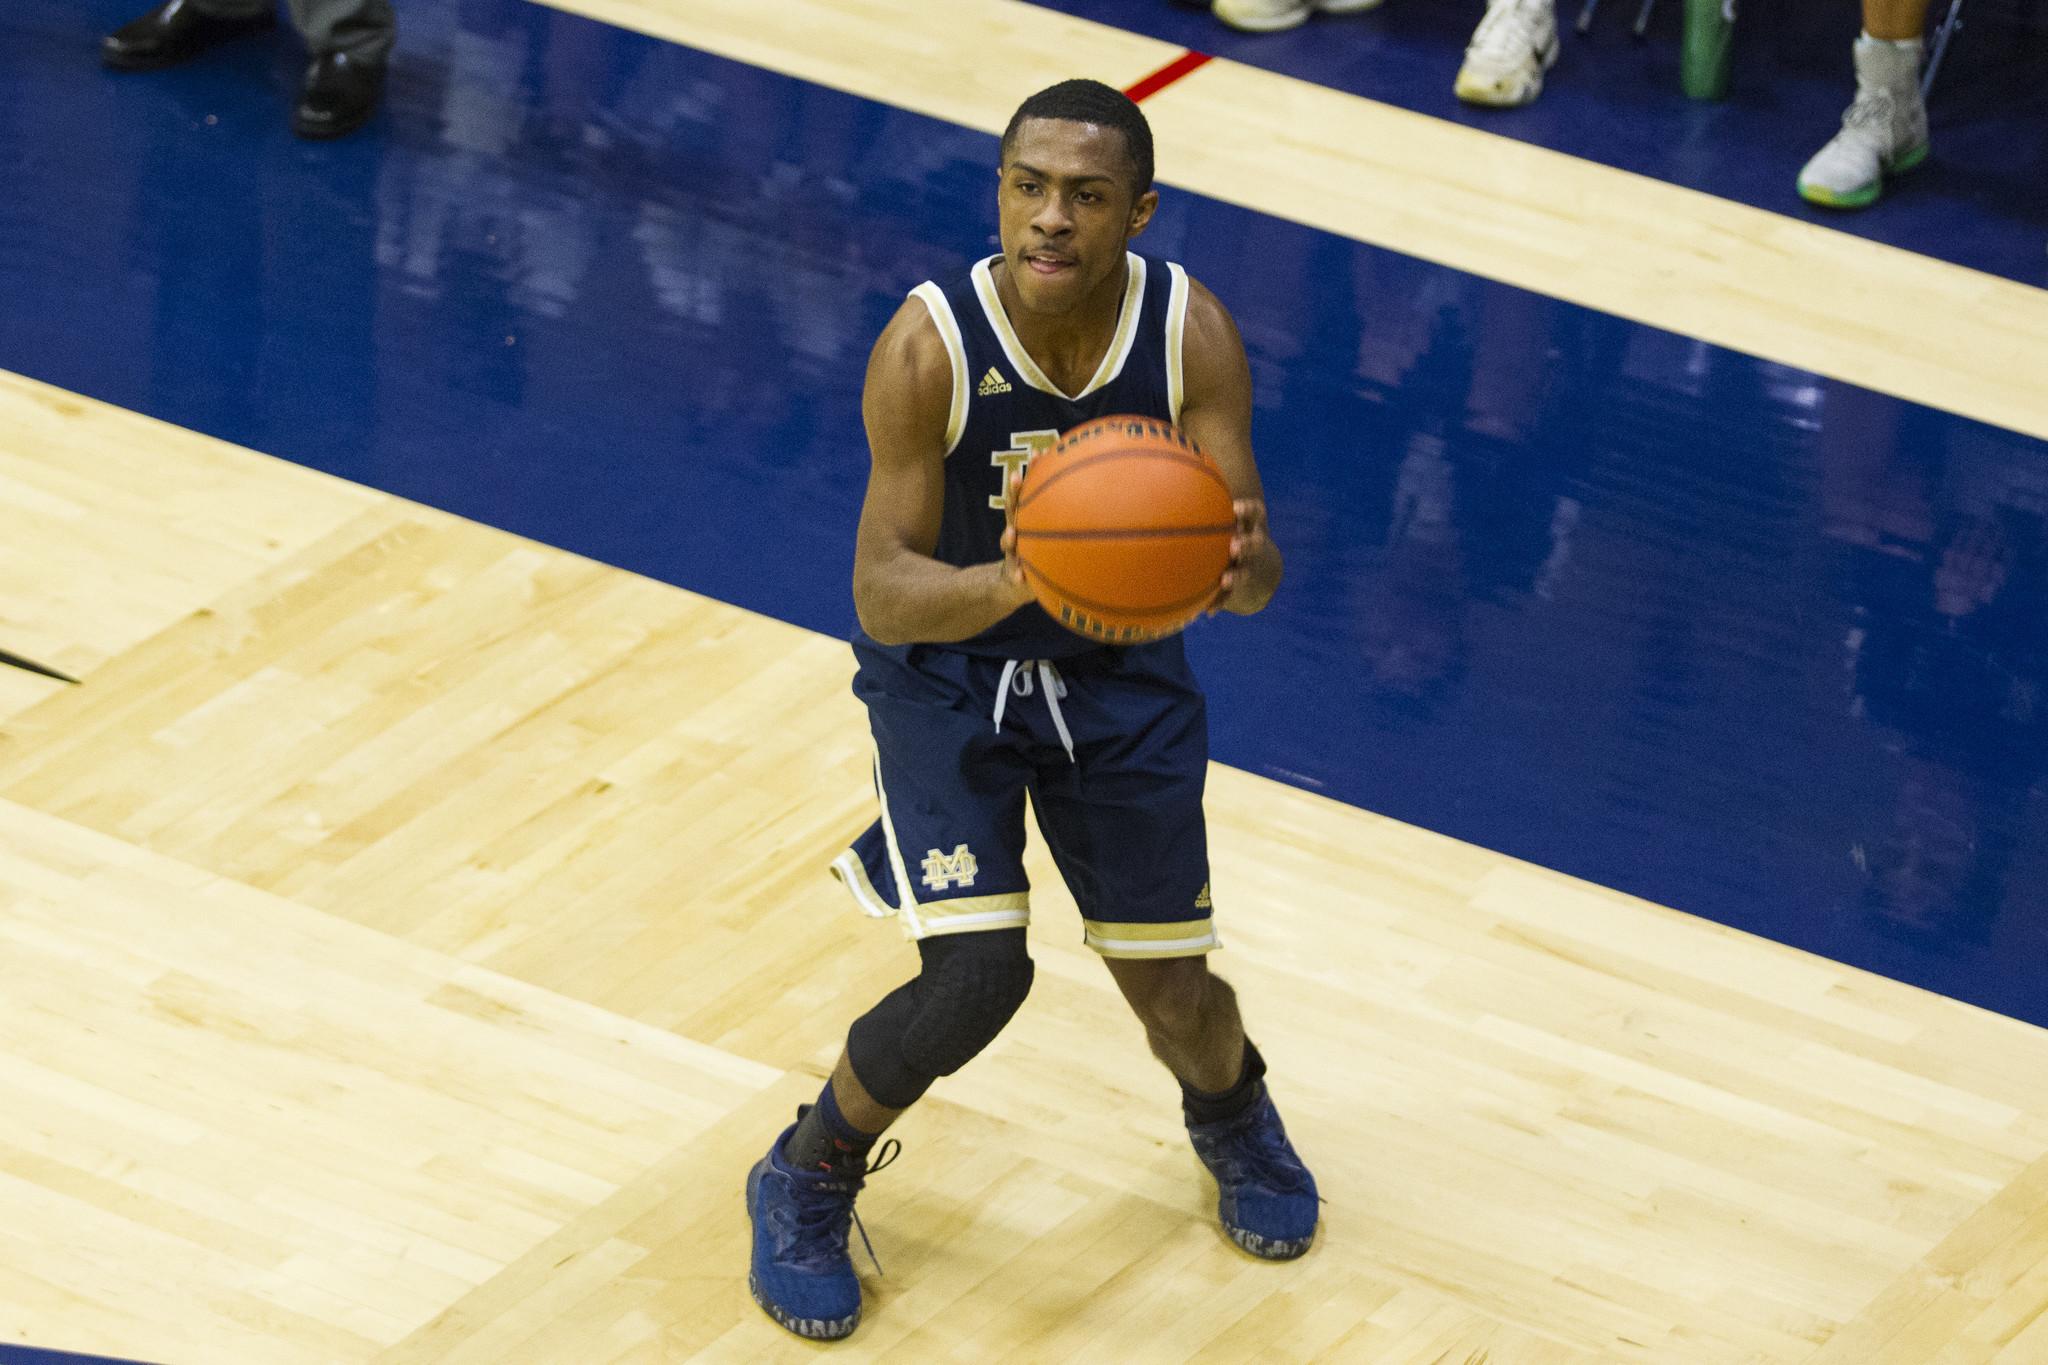 Union-Tribune honors 4,064 student-athletes - The San ...